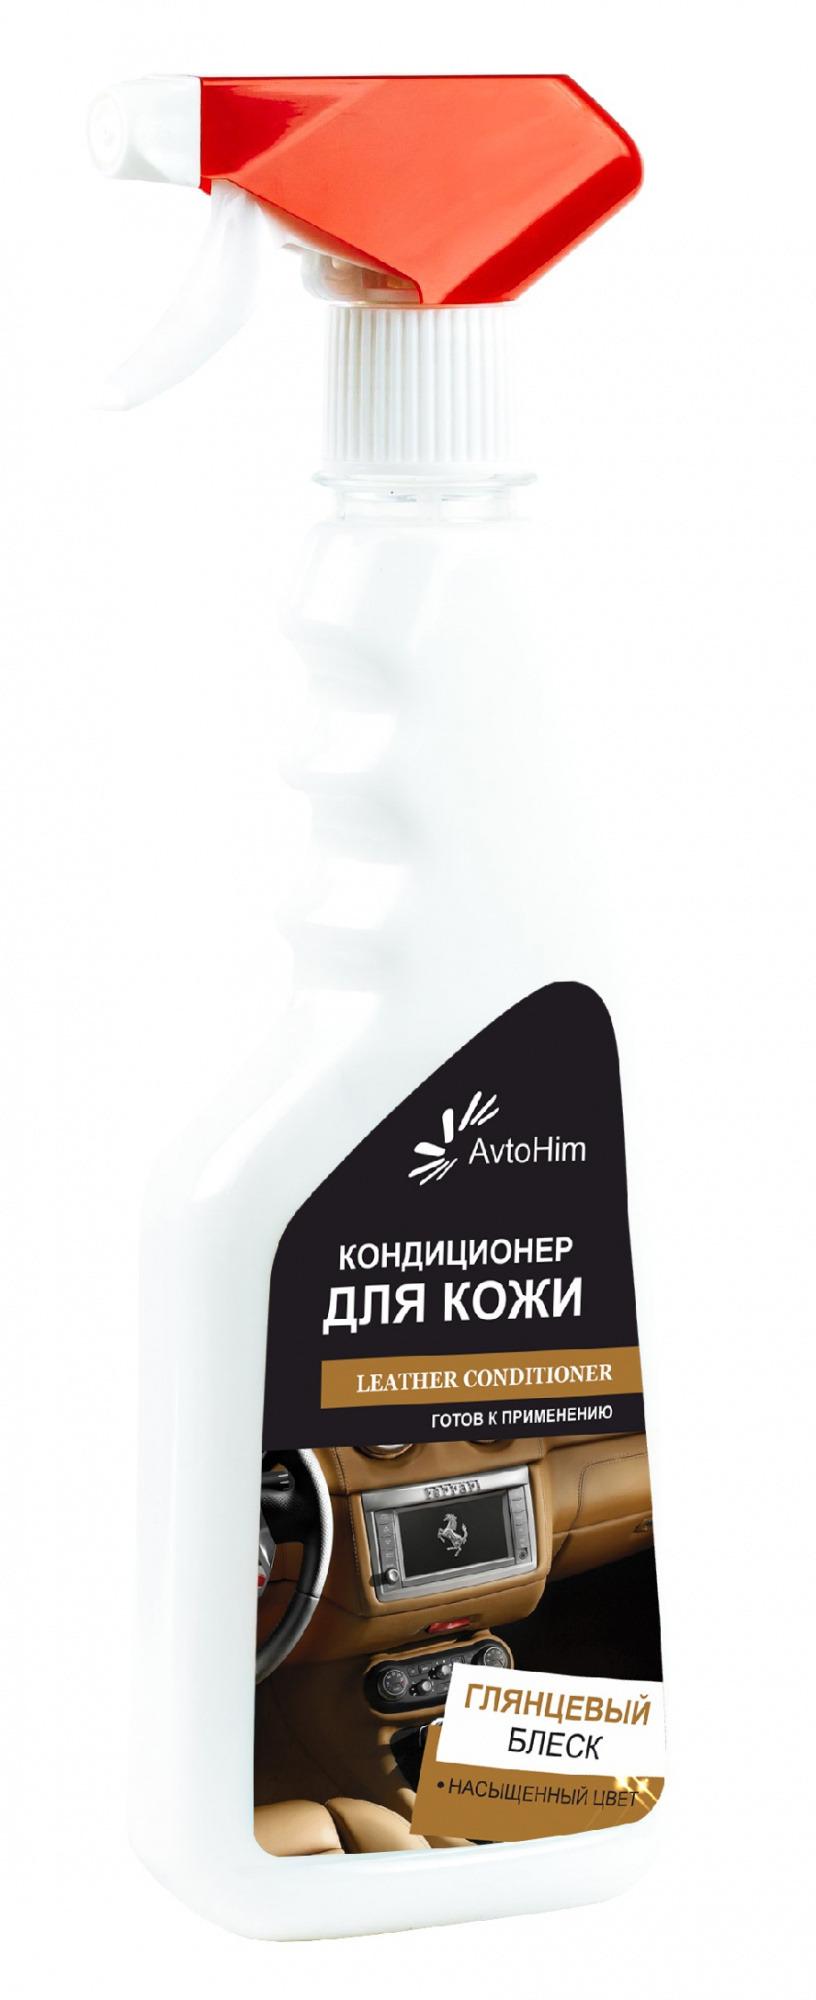 Кондиционер Avtohim для очистки изделий для кожи 0,5л фото